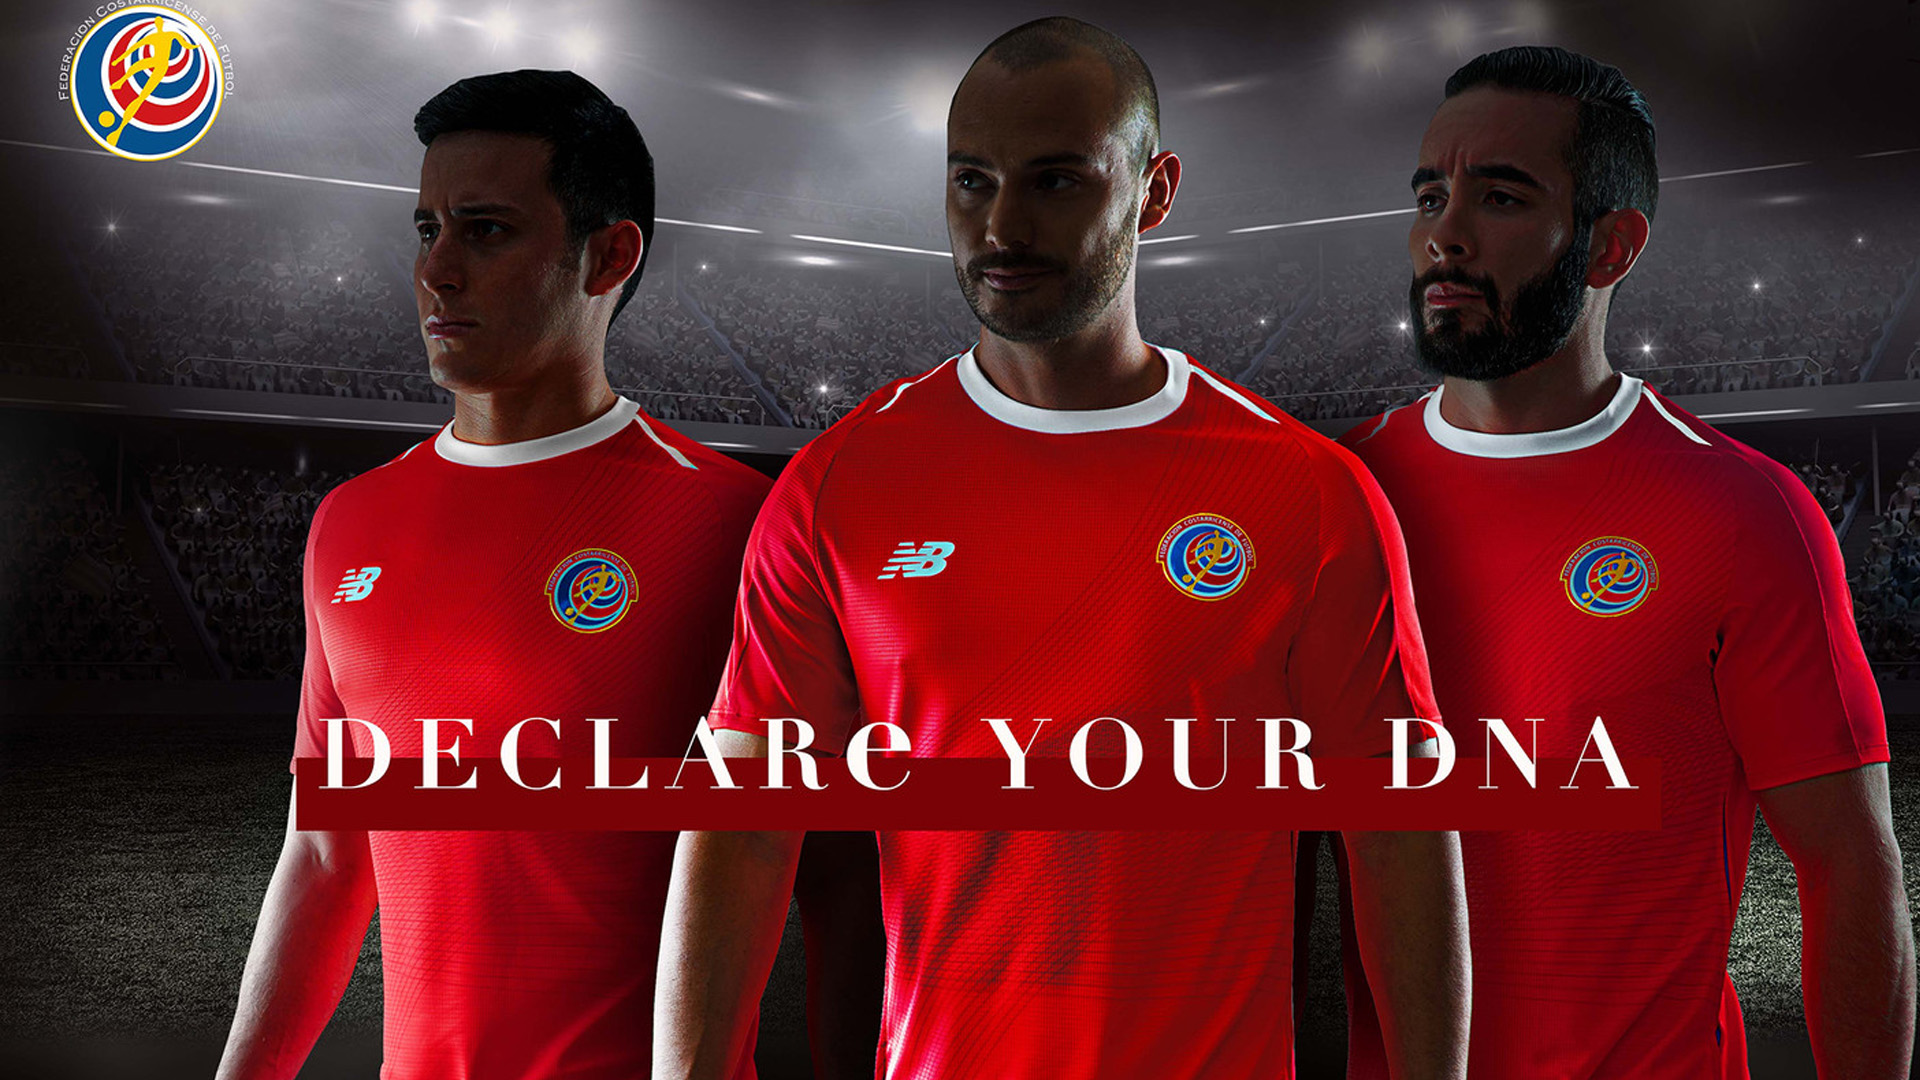 Costa Rica Camiseta Titular Home Kit 2018